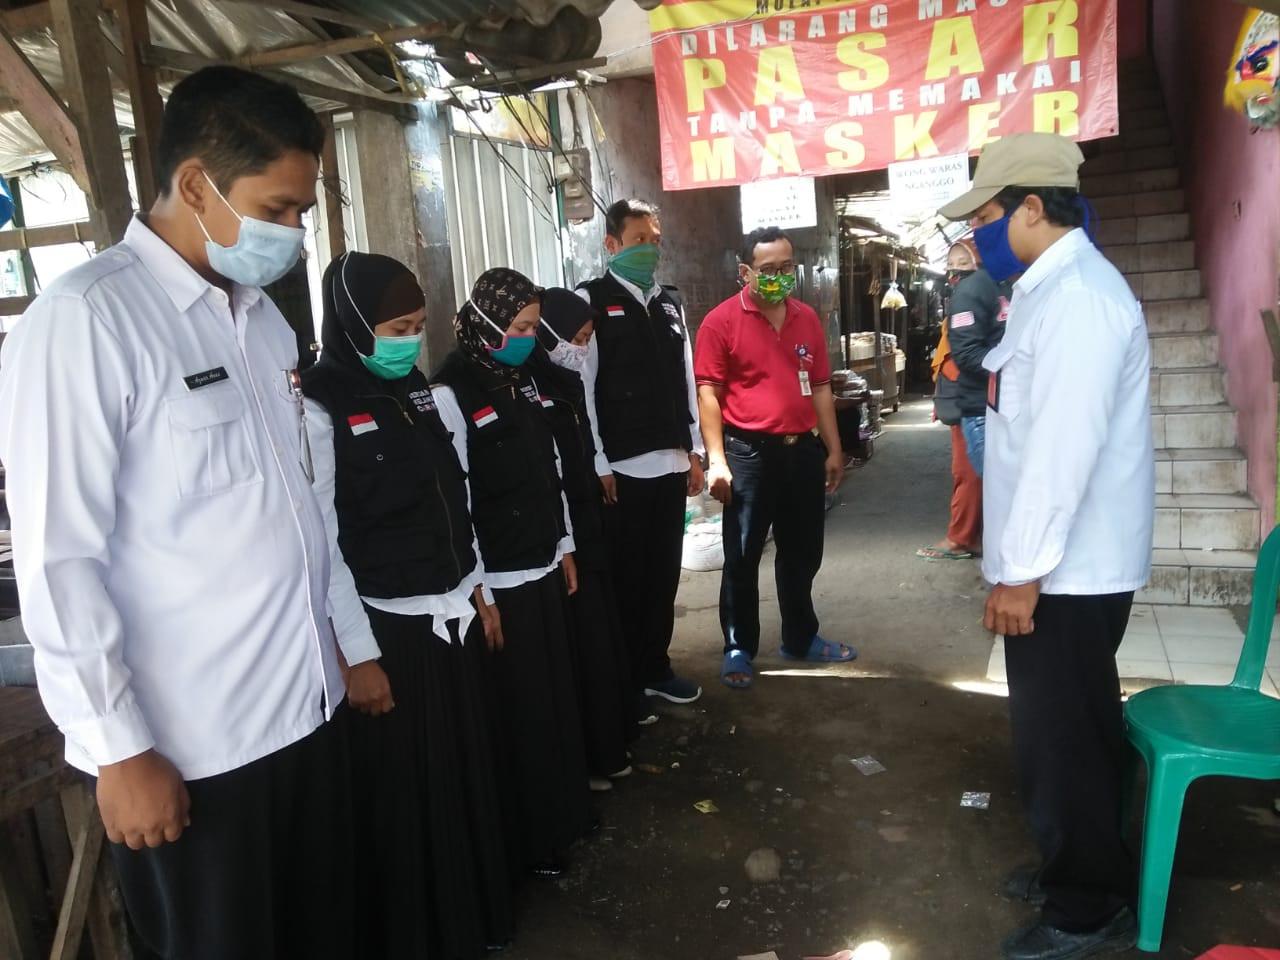 Penjagaan Pasar Dalam Rangka PKM (Pembatasan Kegiatan Masyarakat)   Dan Apel Siang Di Pasar Gajah